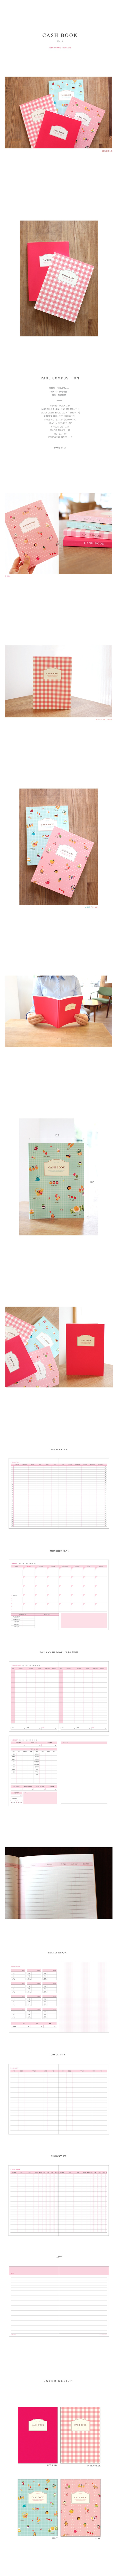 Sell Stationery Cash Book Ver 3 - Mint PMMYRSPLNCB_001_003 $25 #malaysianbabes #malaysianshopper #malaysiashopper #malaysiashopping #malaysianshopping #onlineshop #onlineshopping #sggirls #koreafashion #koreanfashion #fashion #pikomiko #shoppingspree #spree #poslaju #posmalaysia #malaysiashop #cashbook #stationery #cute #passportholder